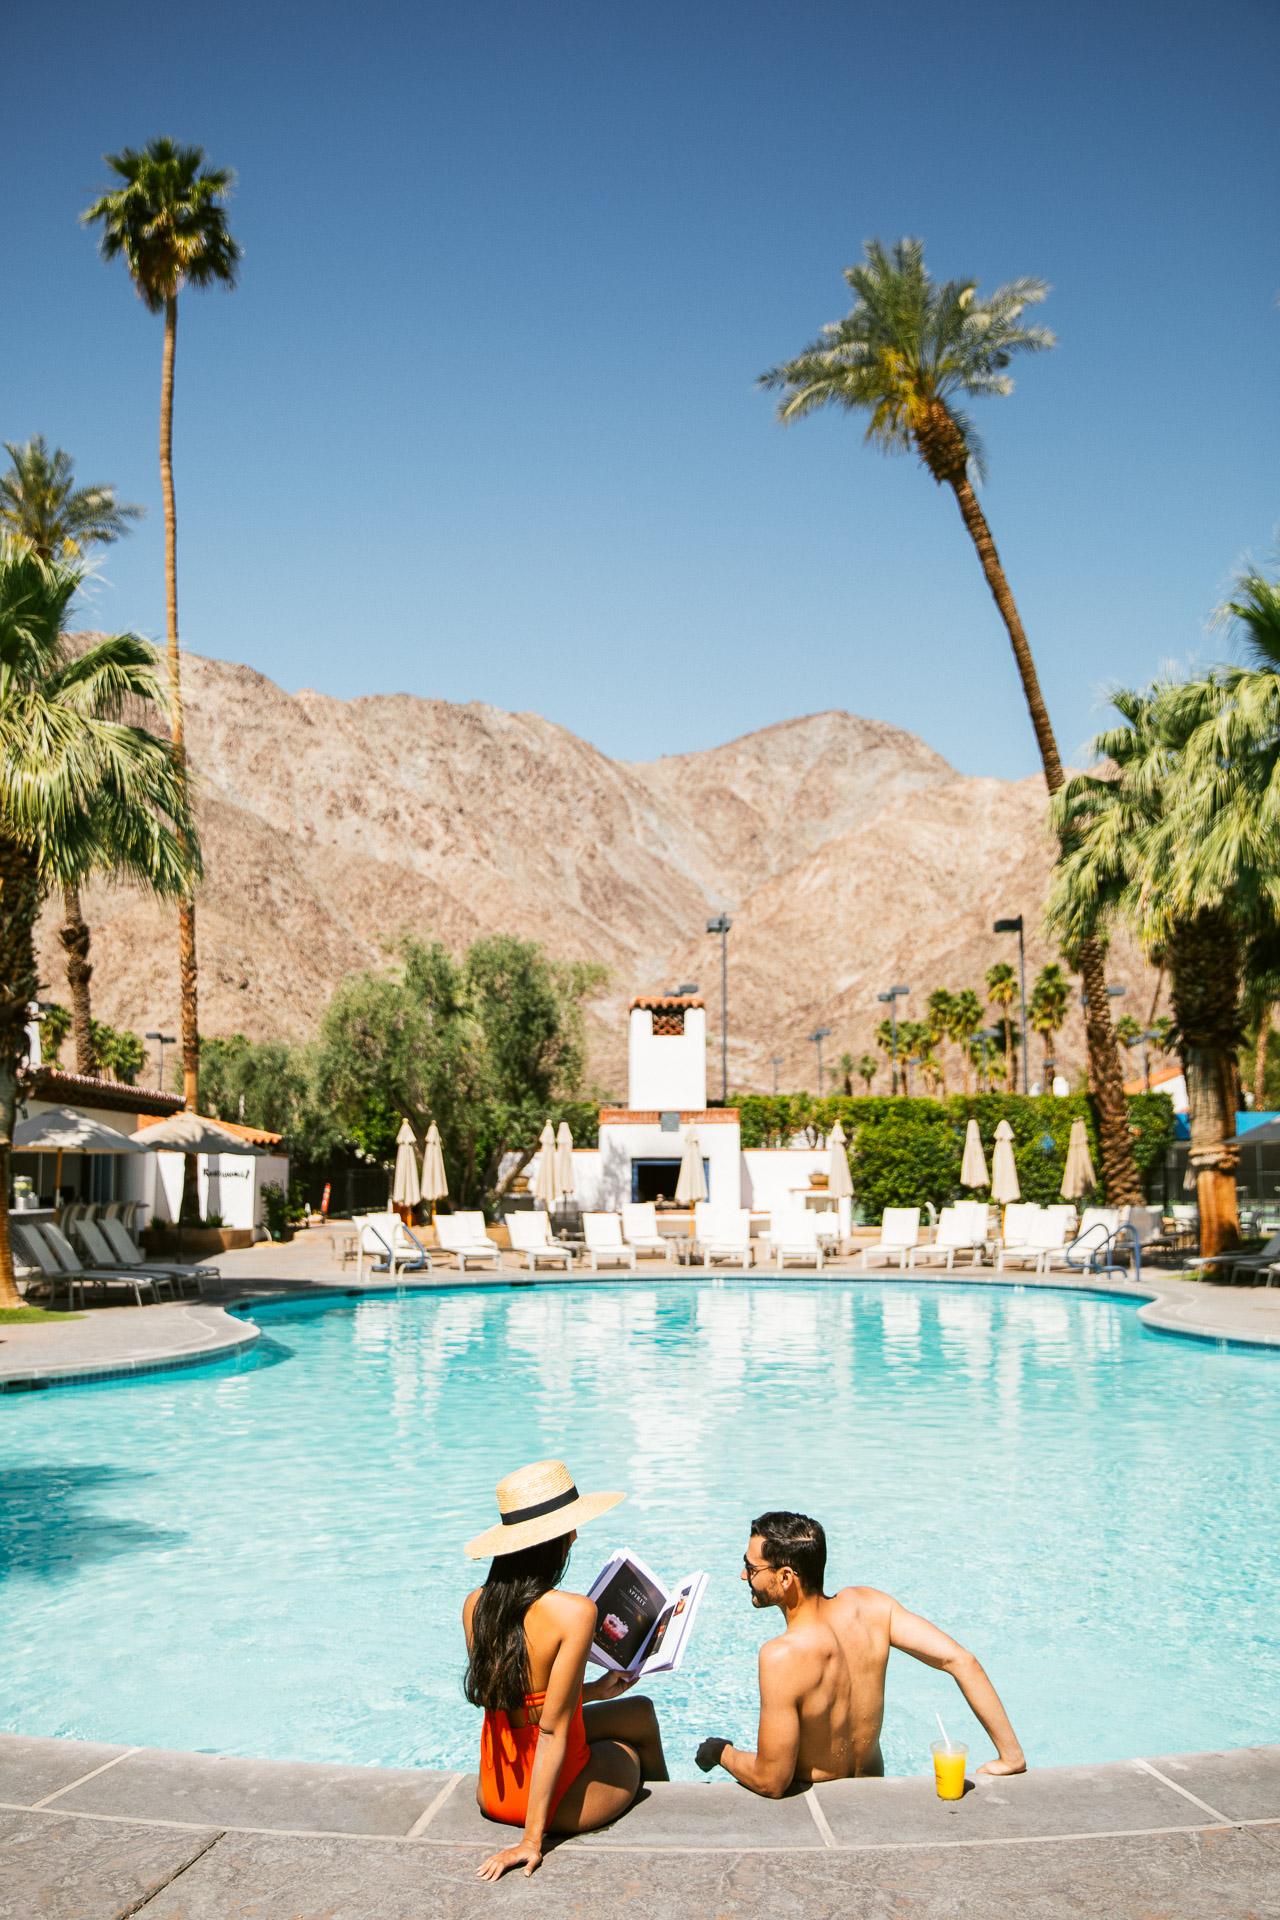 palm-springs-california-hotel-lifestyle-photographer-la-quinta-resort-club-17.jpg